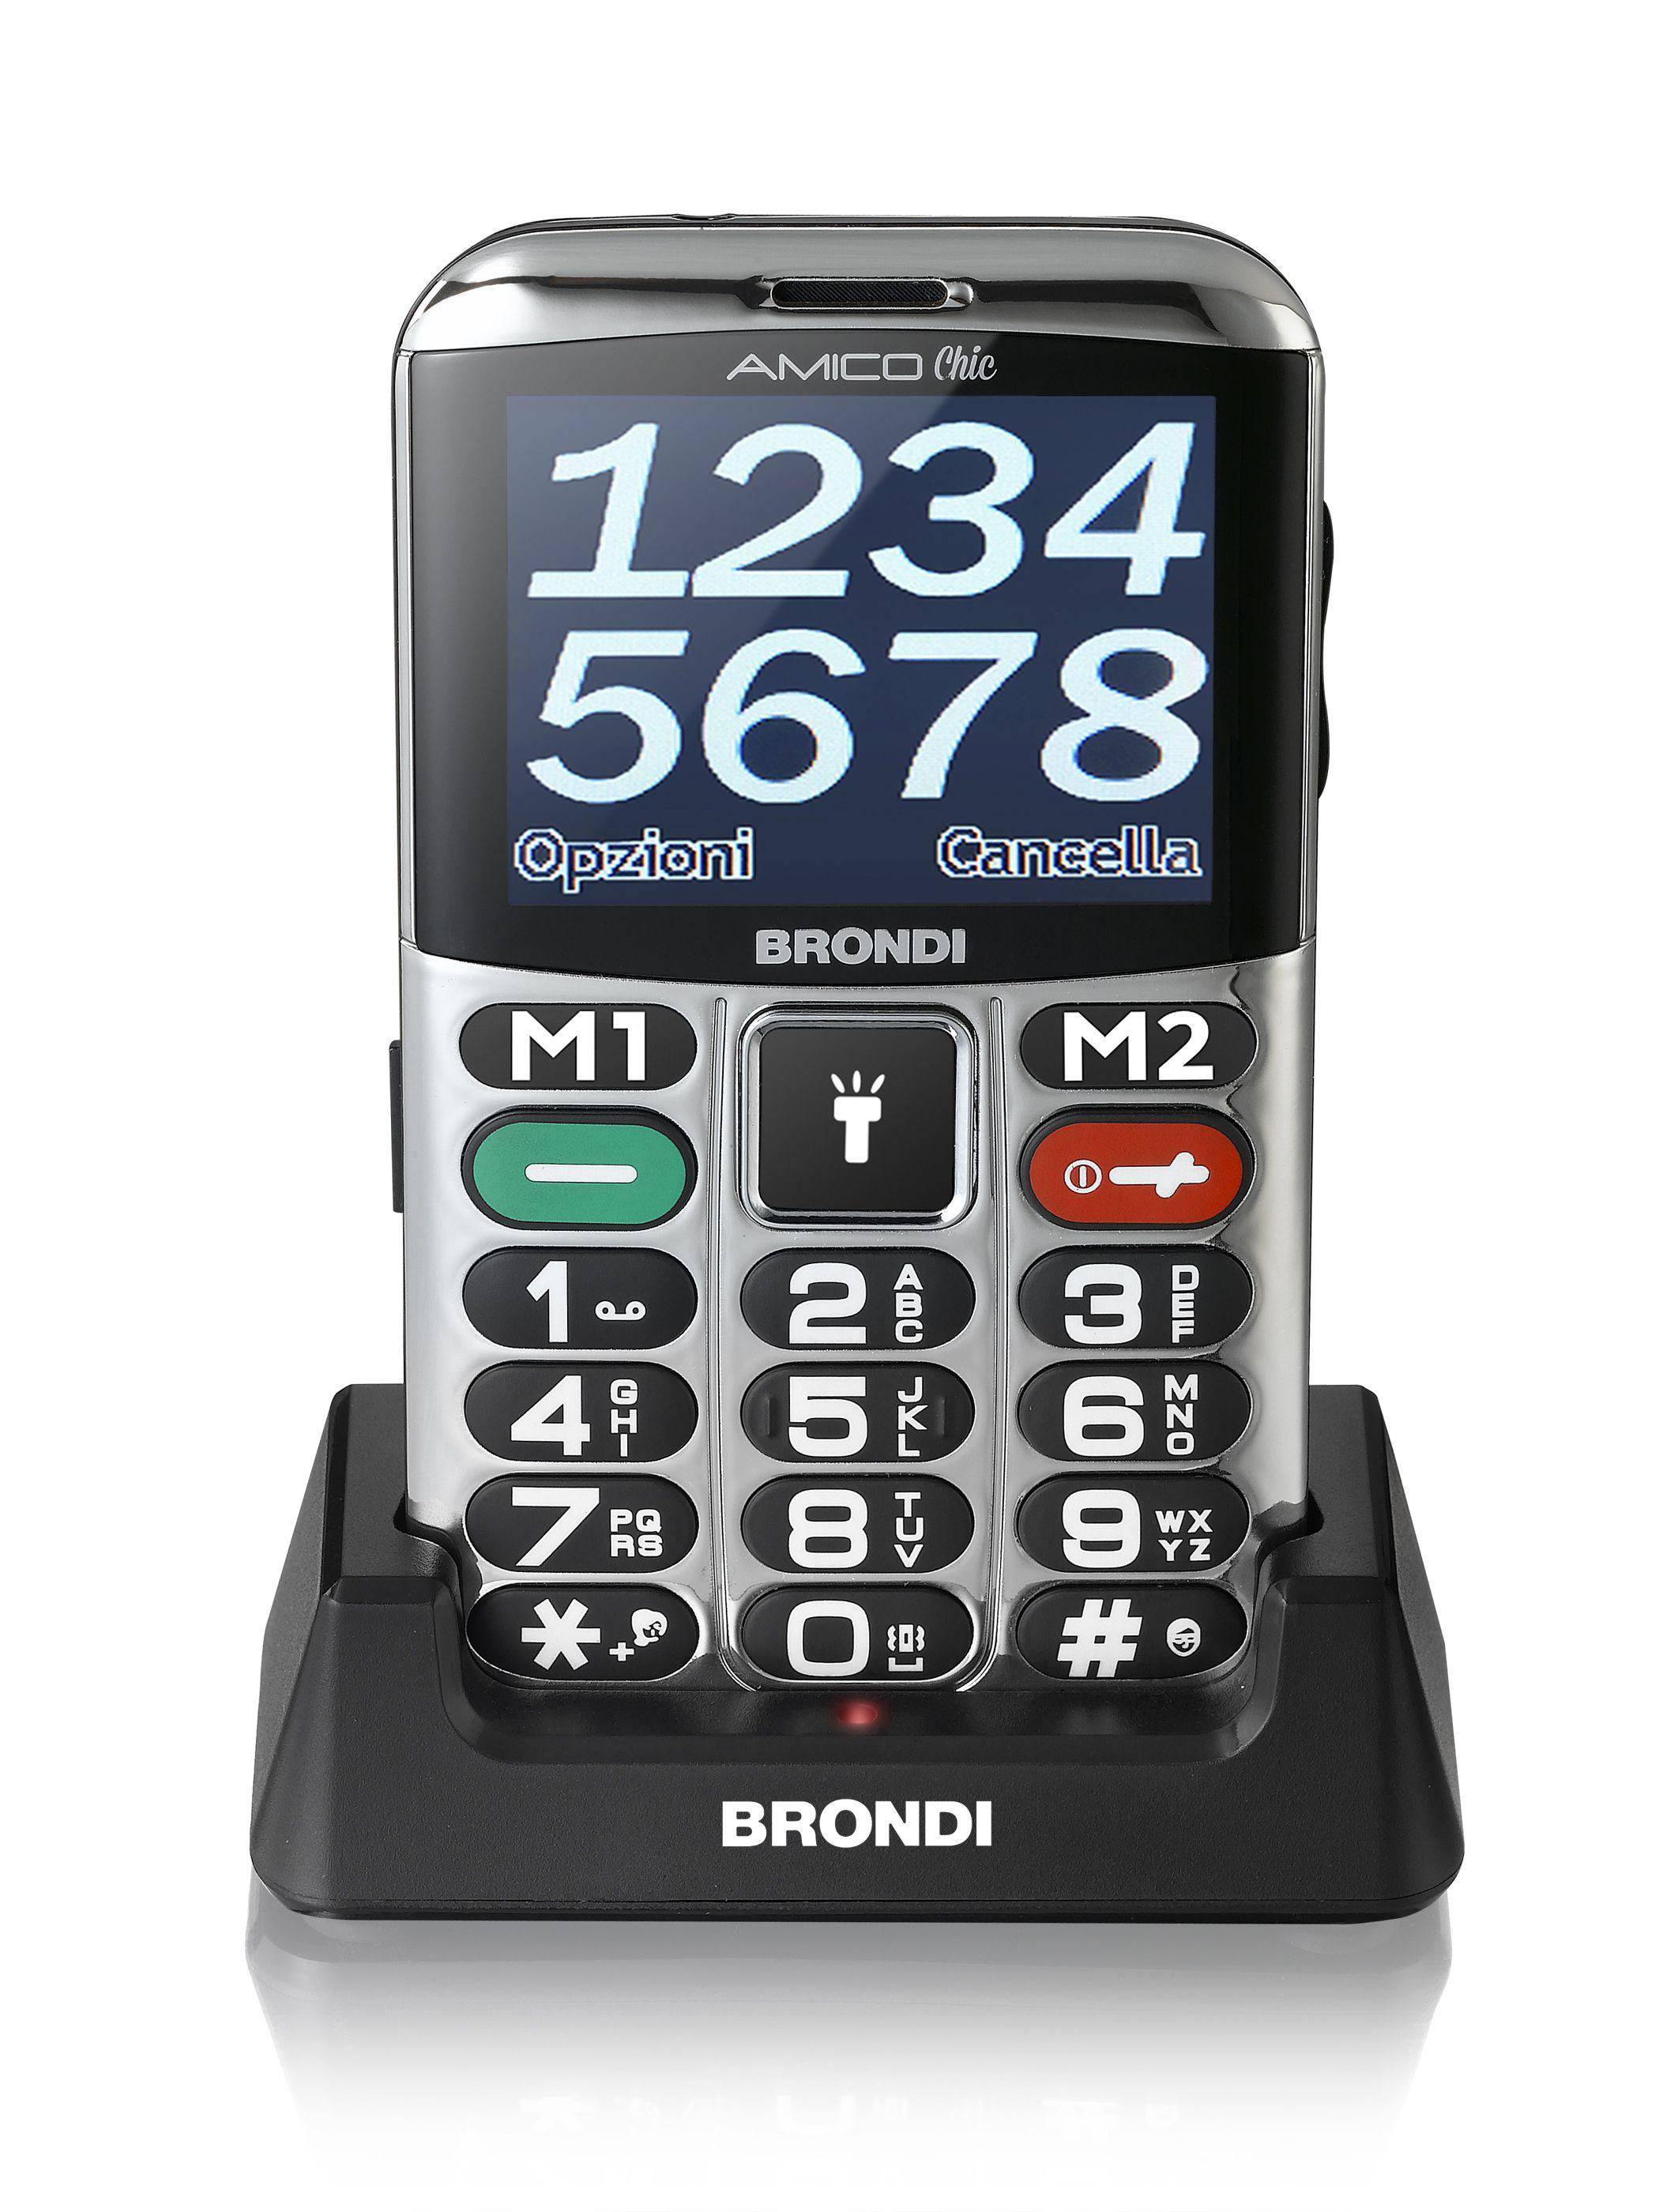 Brondi Amico Chic 6,1 cm (2.4